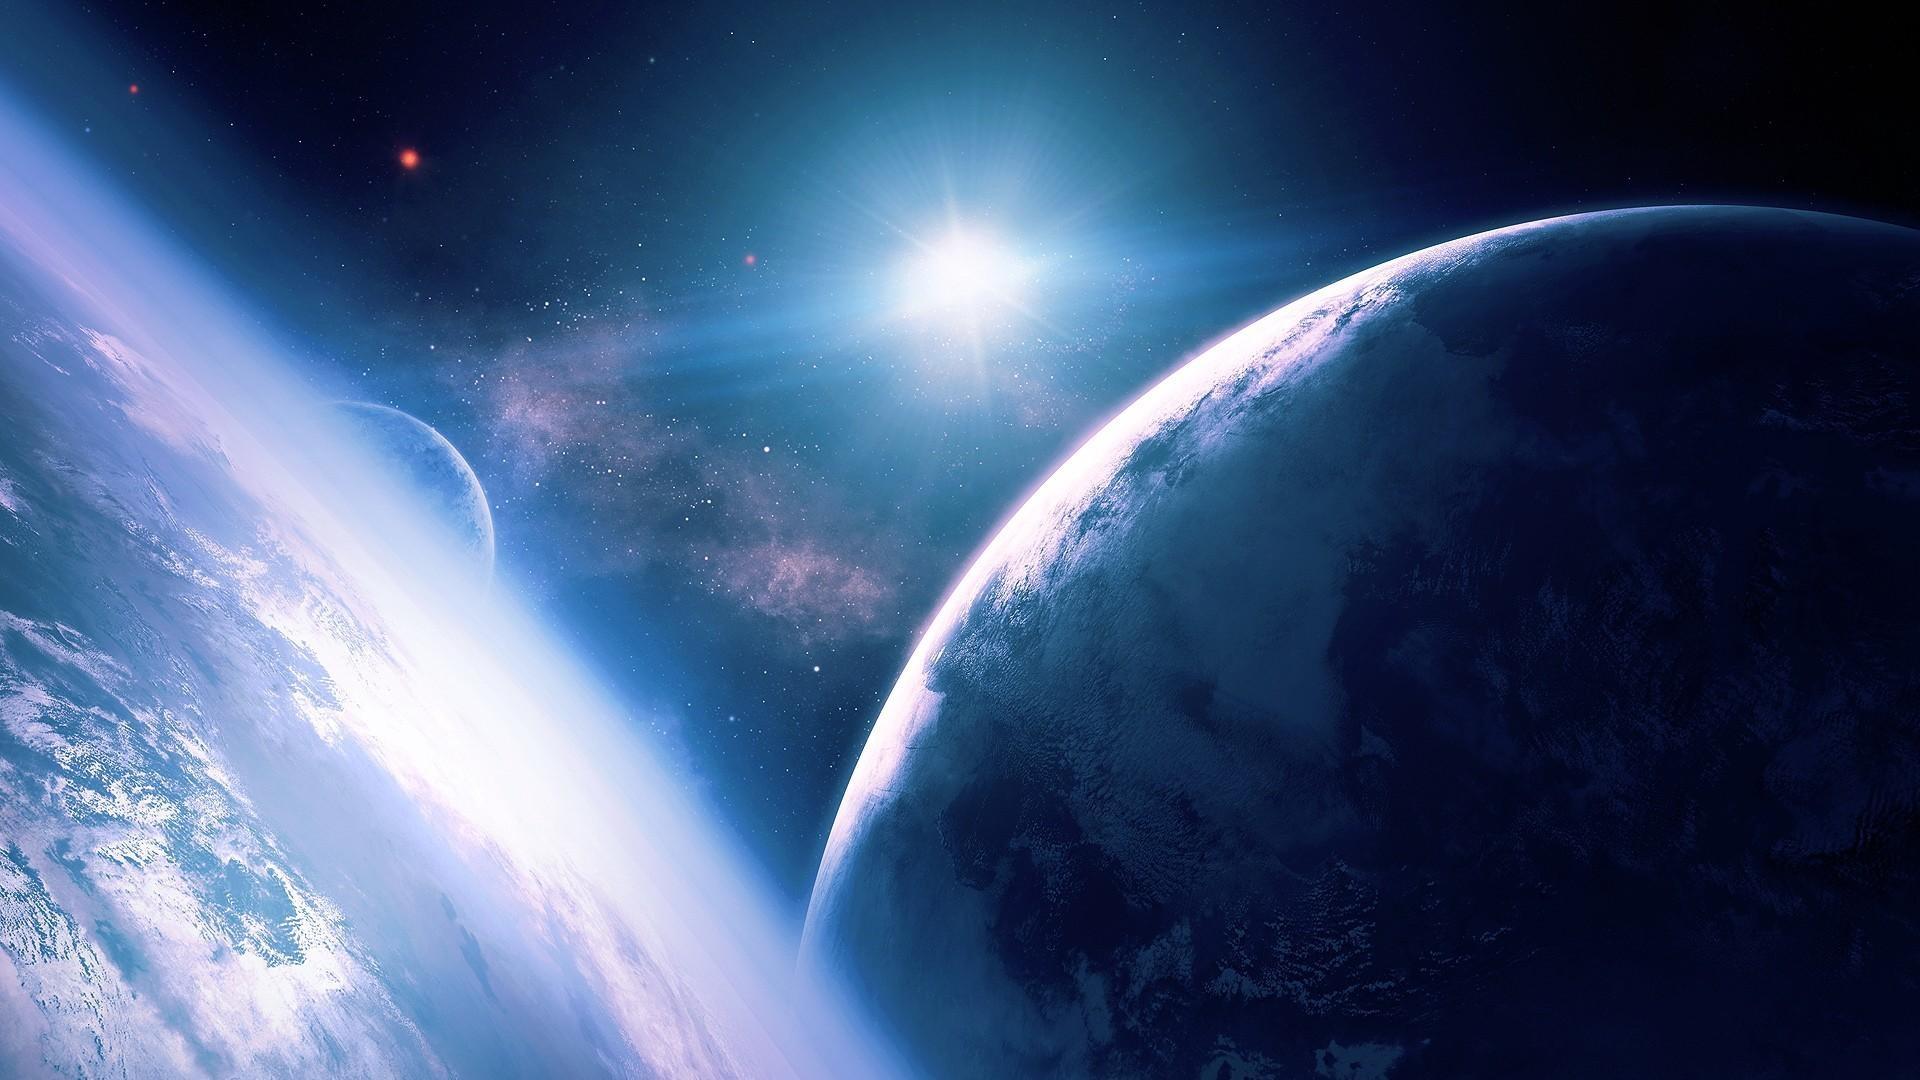 Download Wallpaper 2780x2780 Planet Galaxy Universe: 4K Galaxy Wallpaper